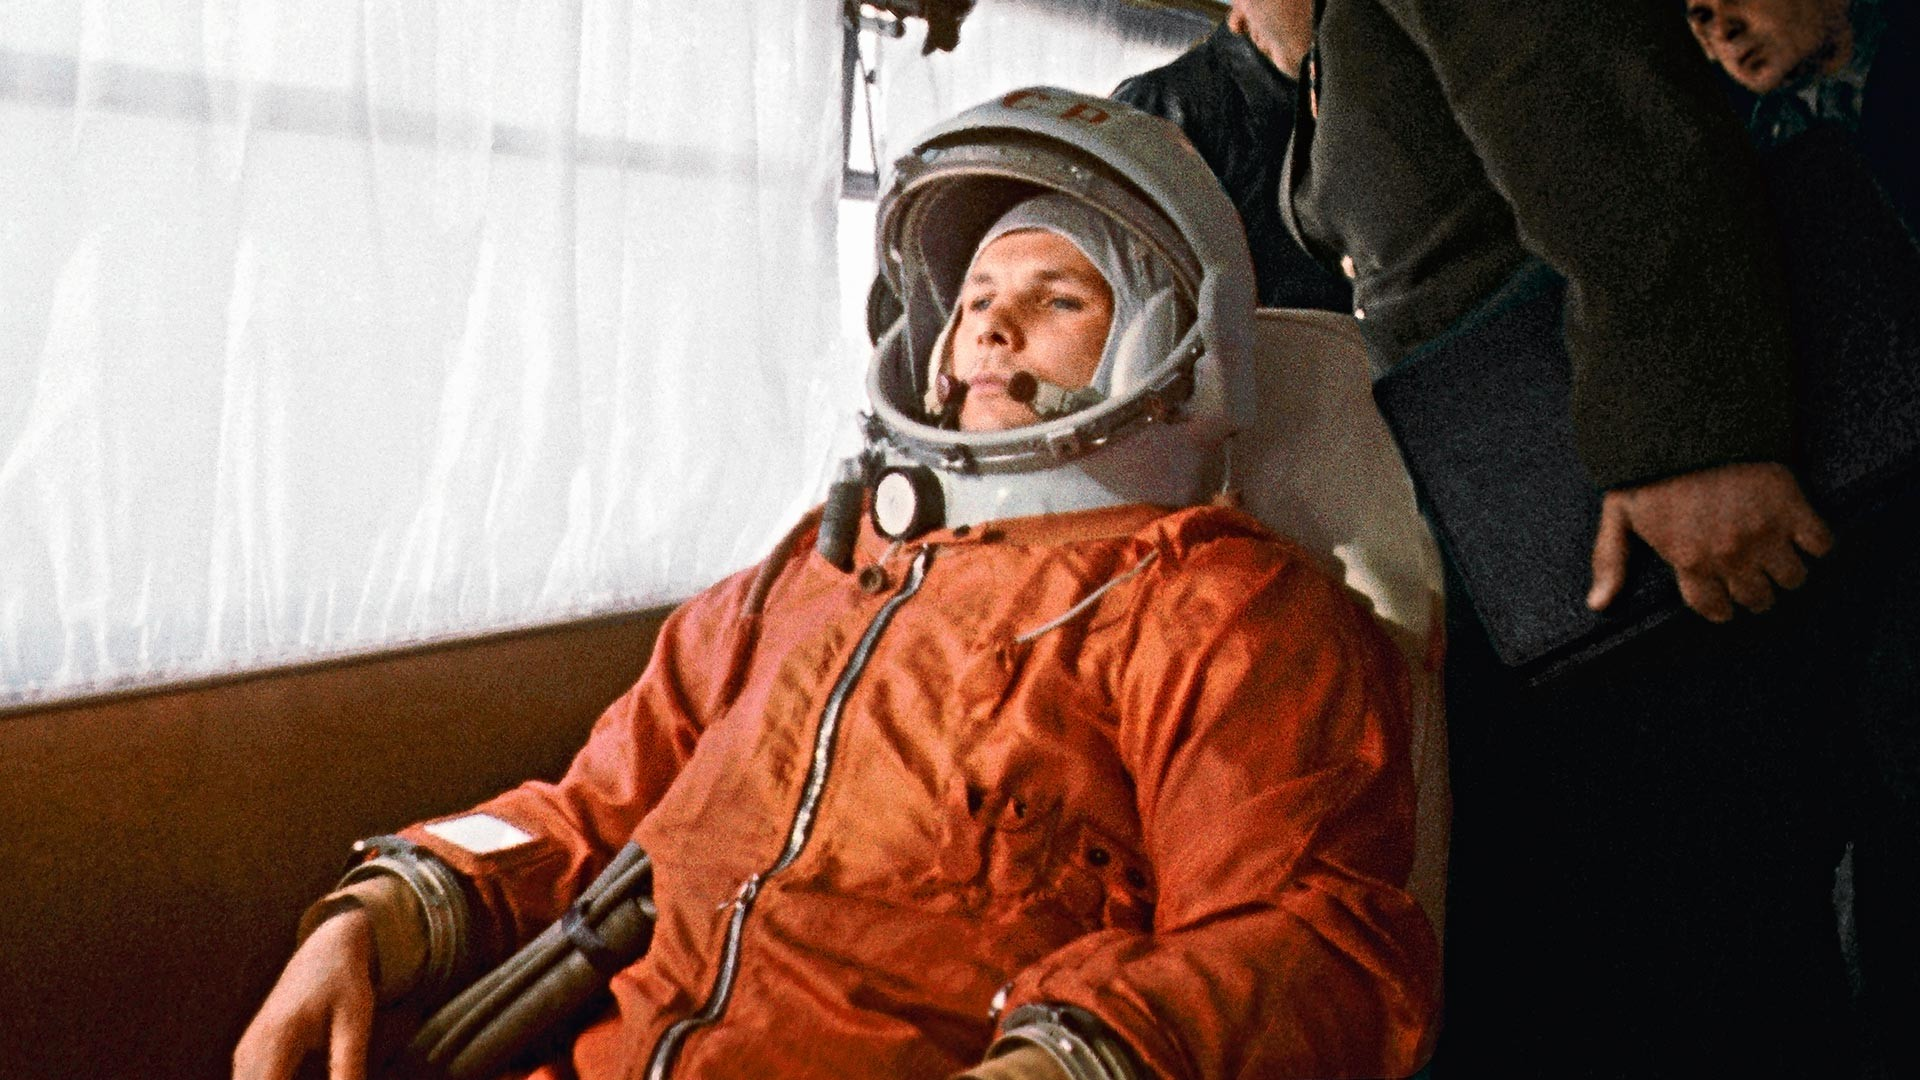 Космонавтът Юрий Гагарин пътува с автобус до космодрума Байконур на 12 април 1961 г.